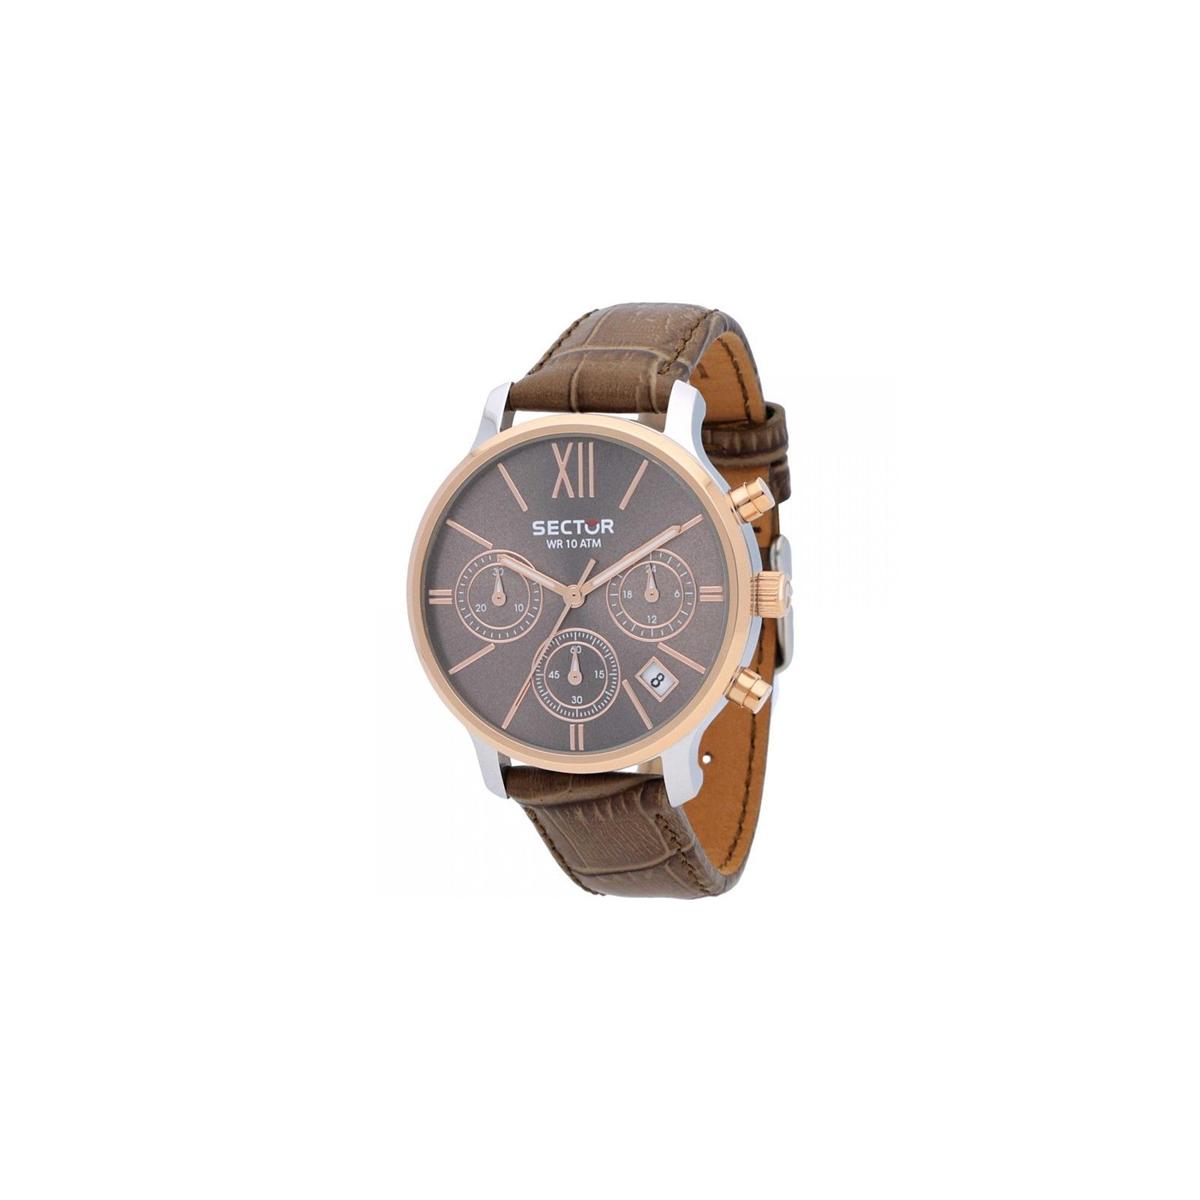 95bb8c217f0d Orologio Cronografo Uomo Sector Watch R3271693501